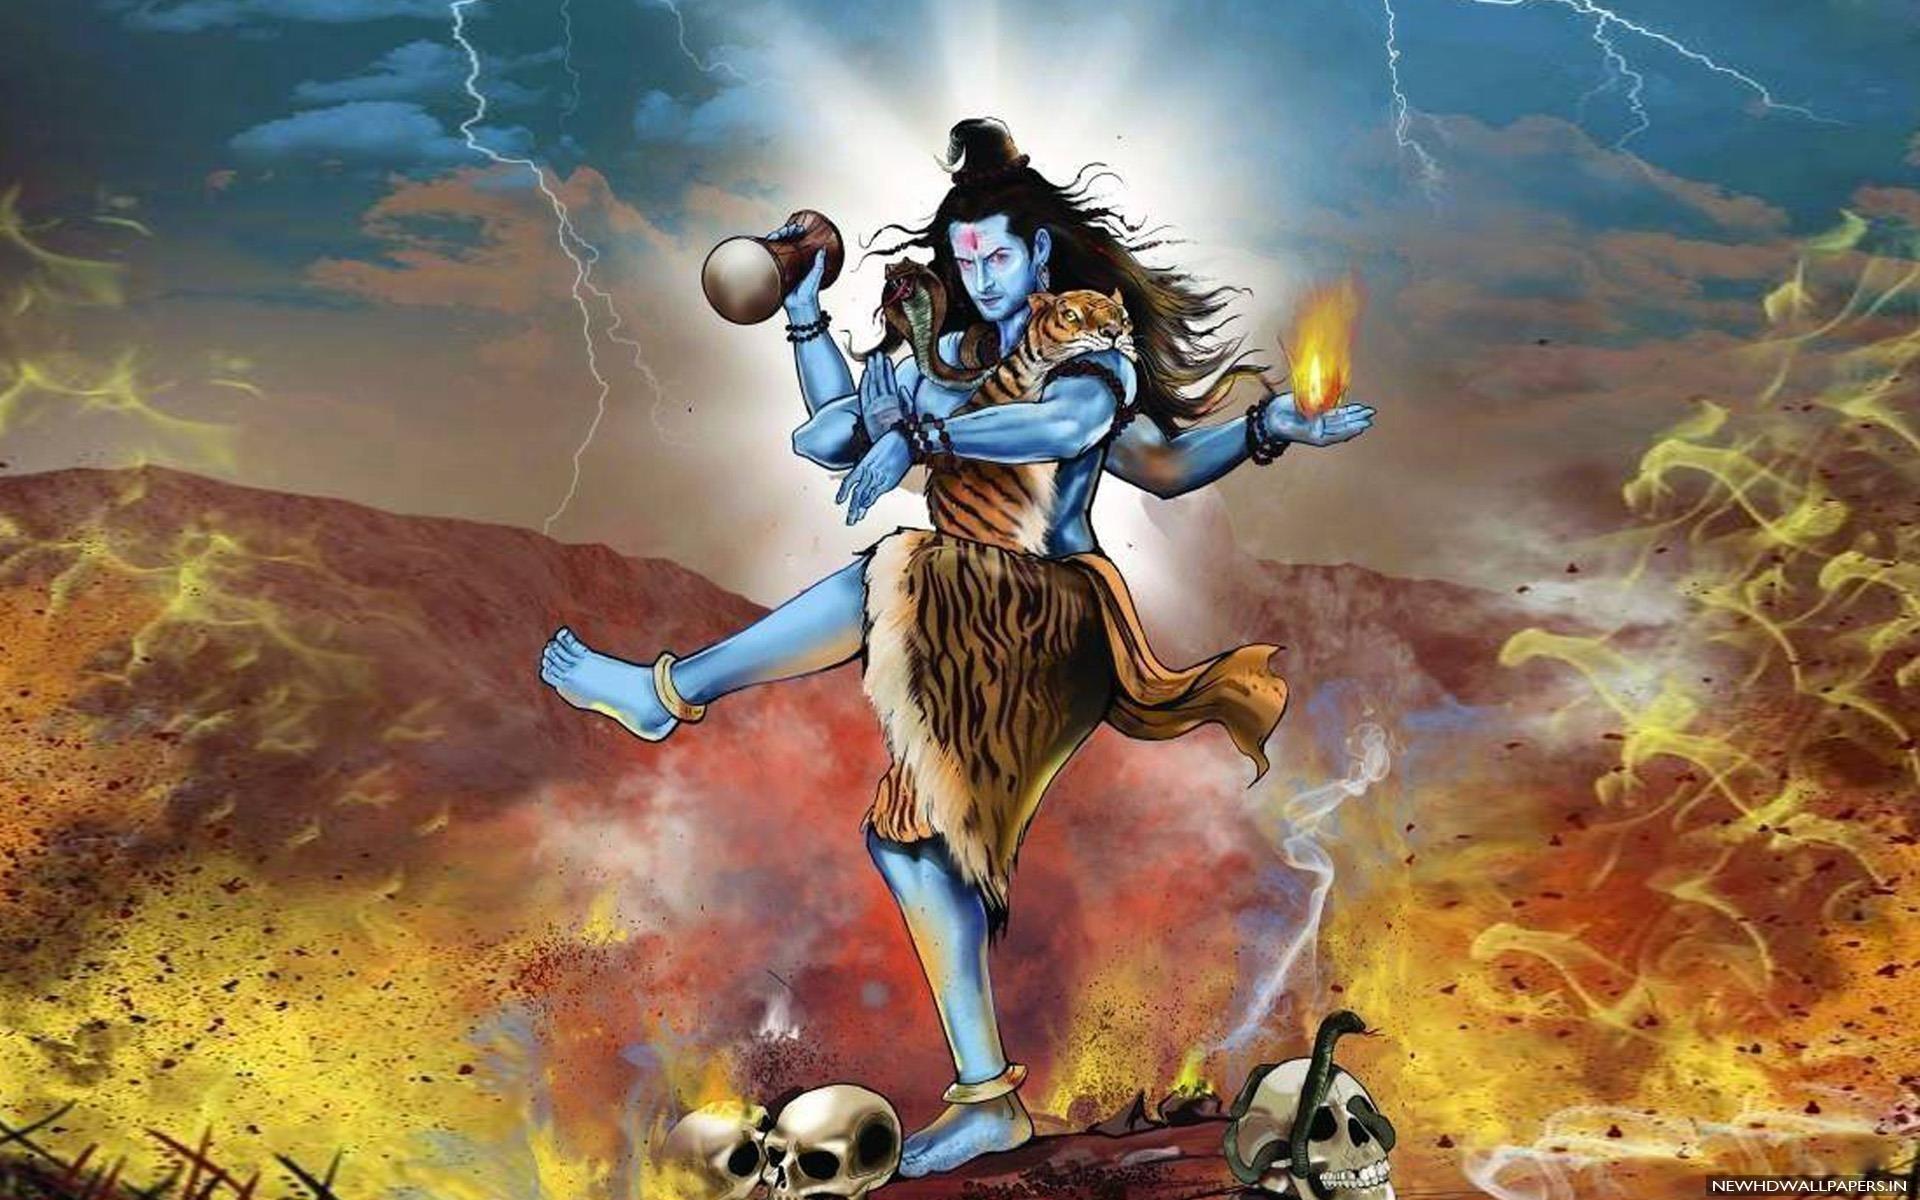 Wallpaper download of shiva - Hd Shiva Wallpapers Wallpapersafari